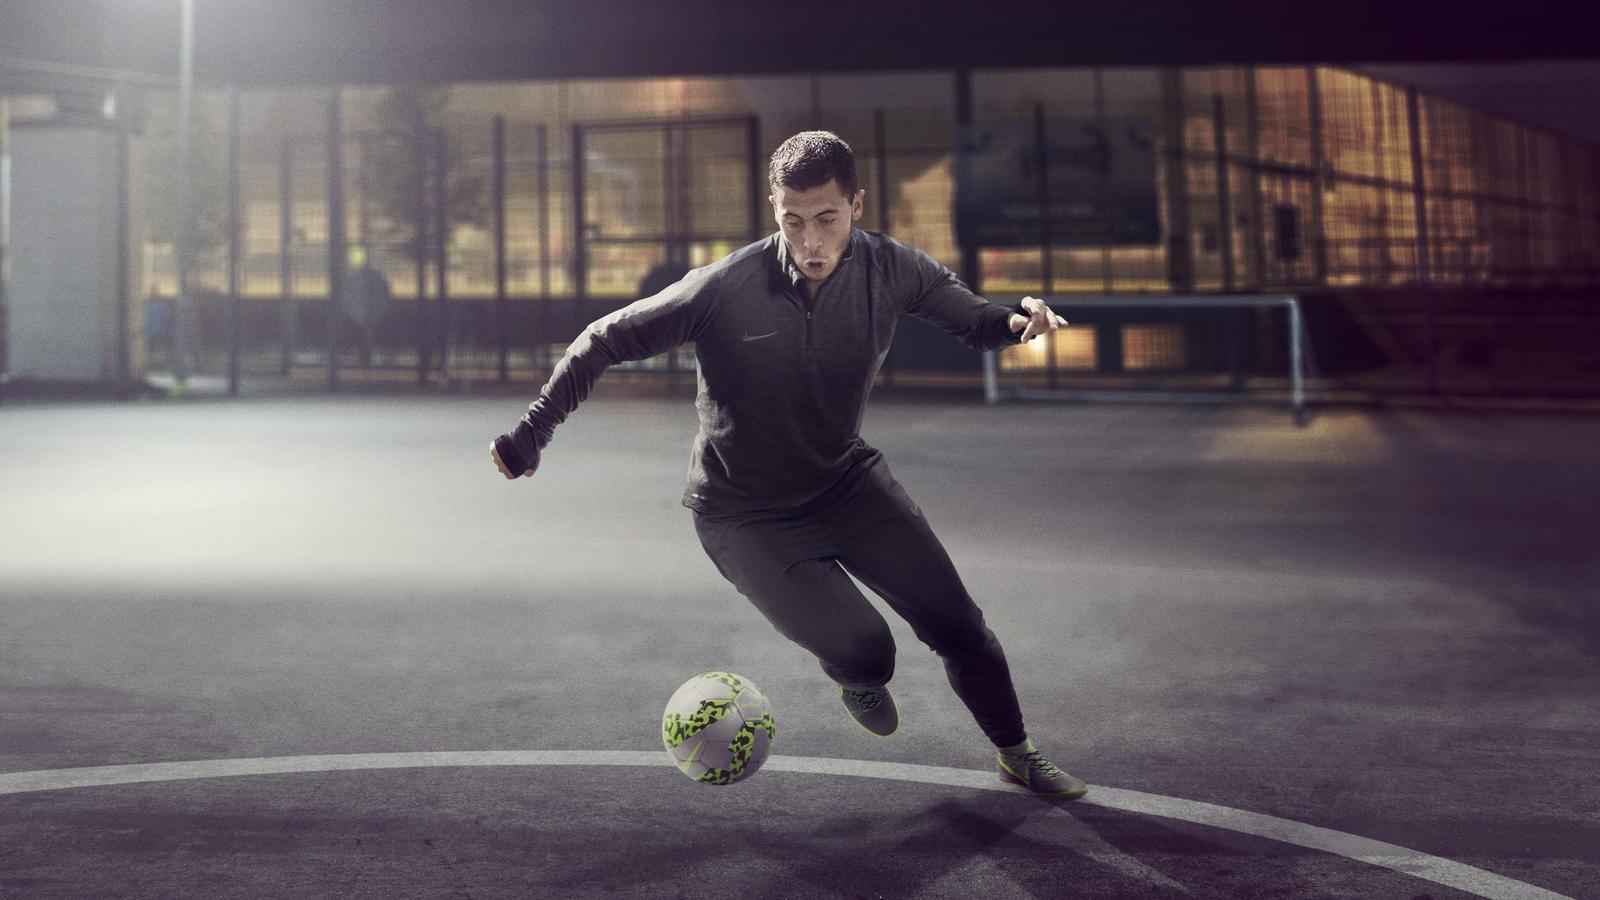 Nike | Elastico Superfly 'Owned'